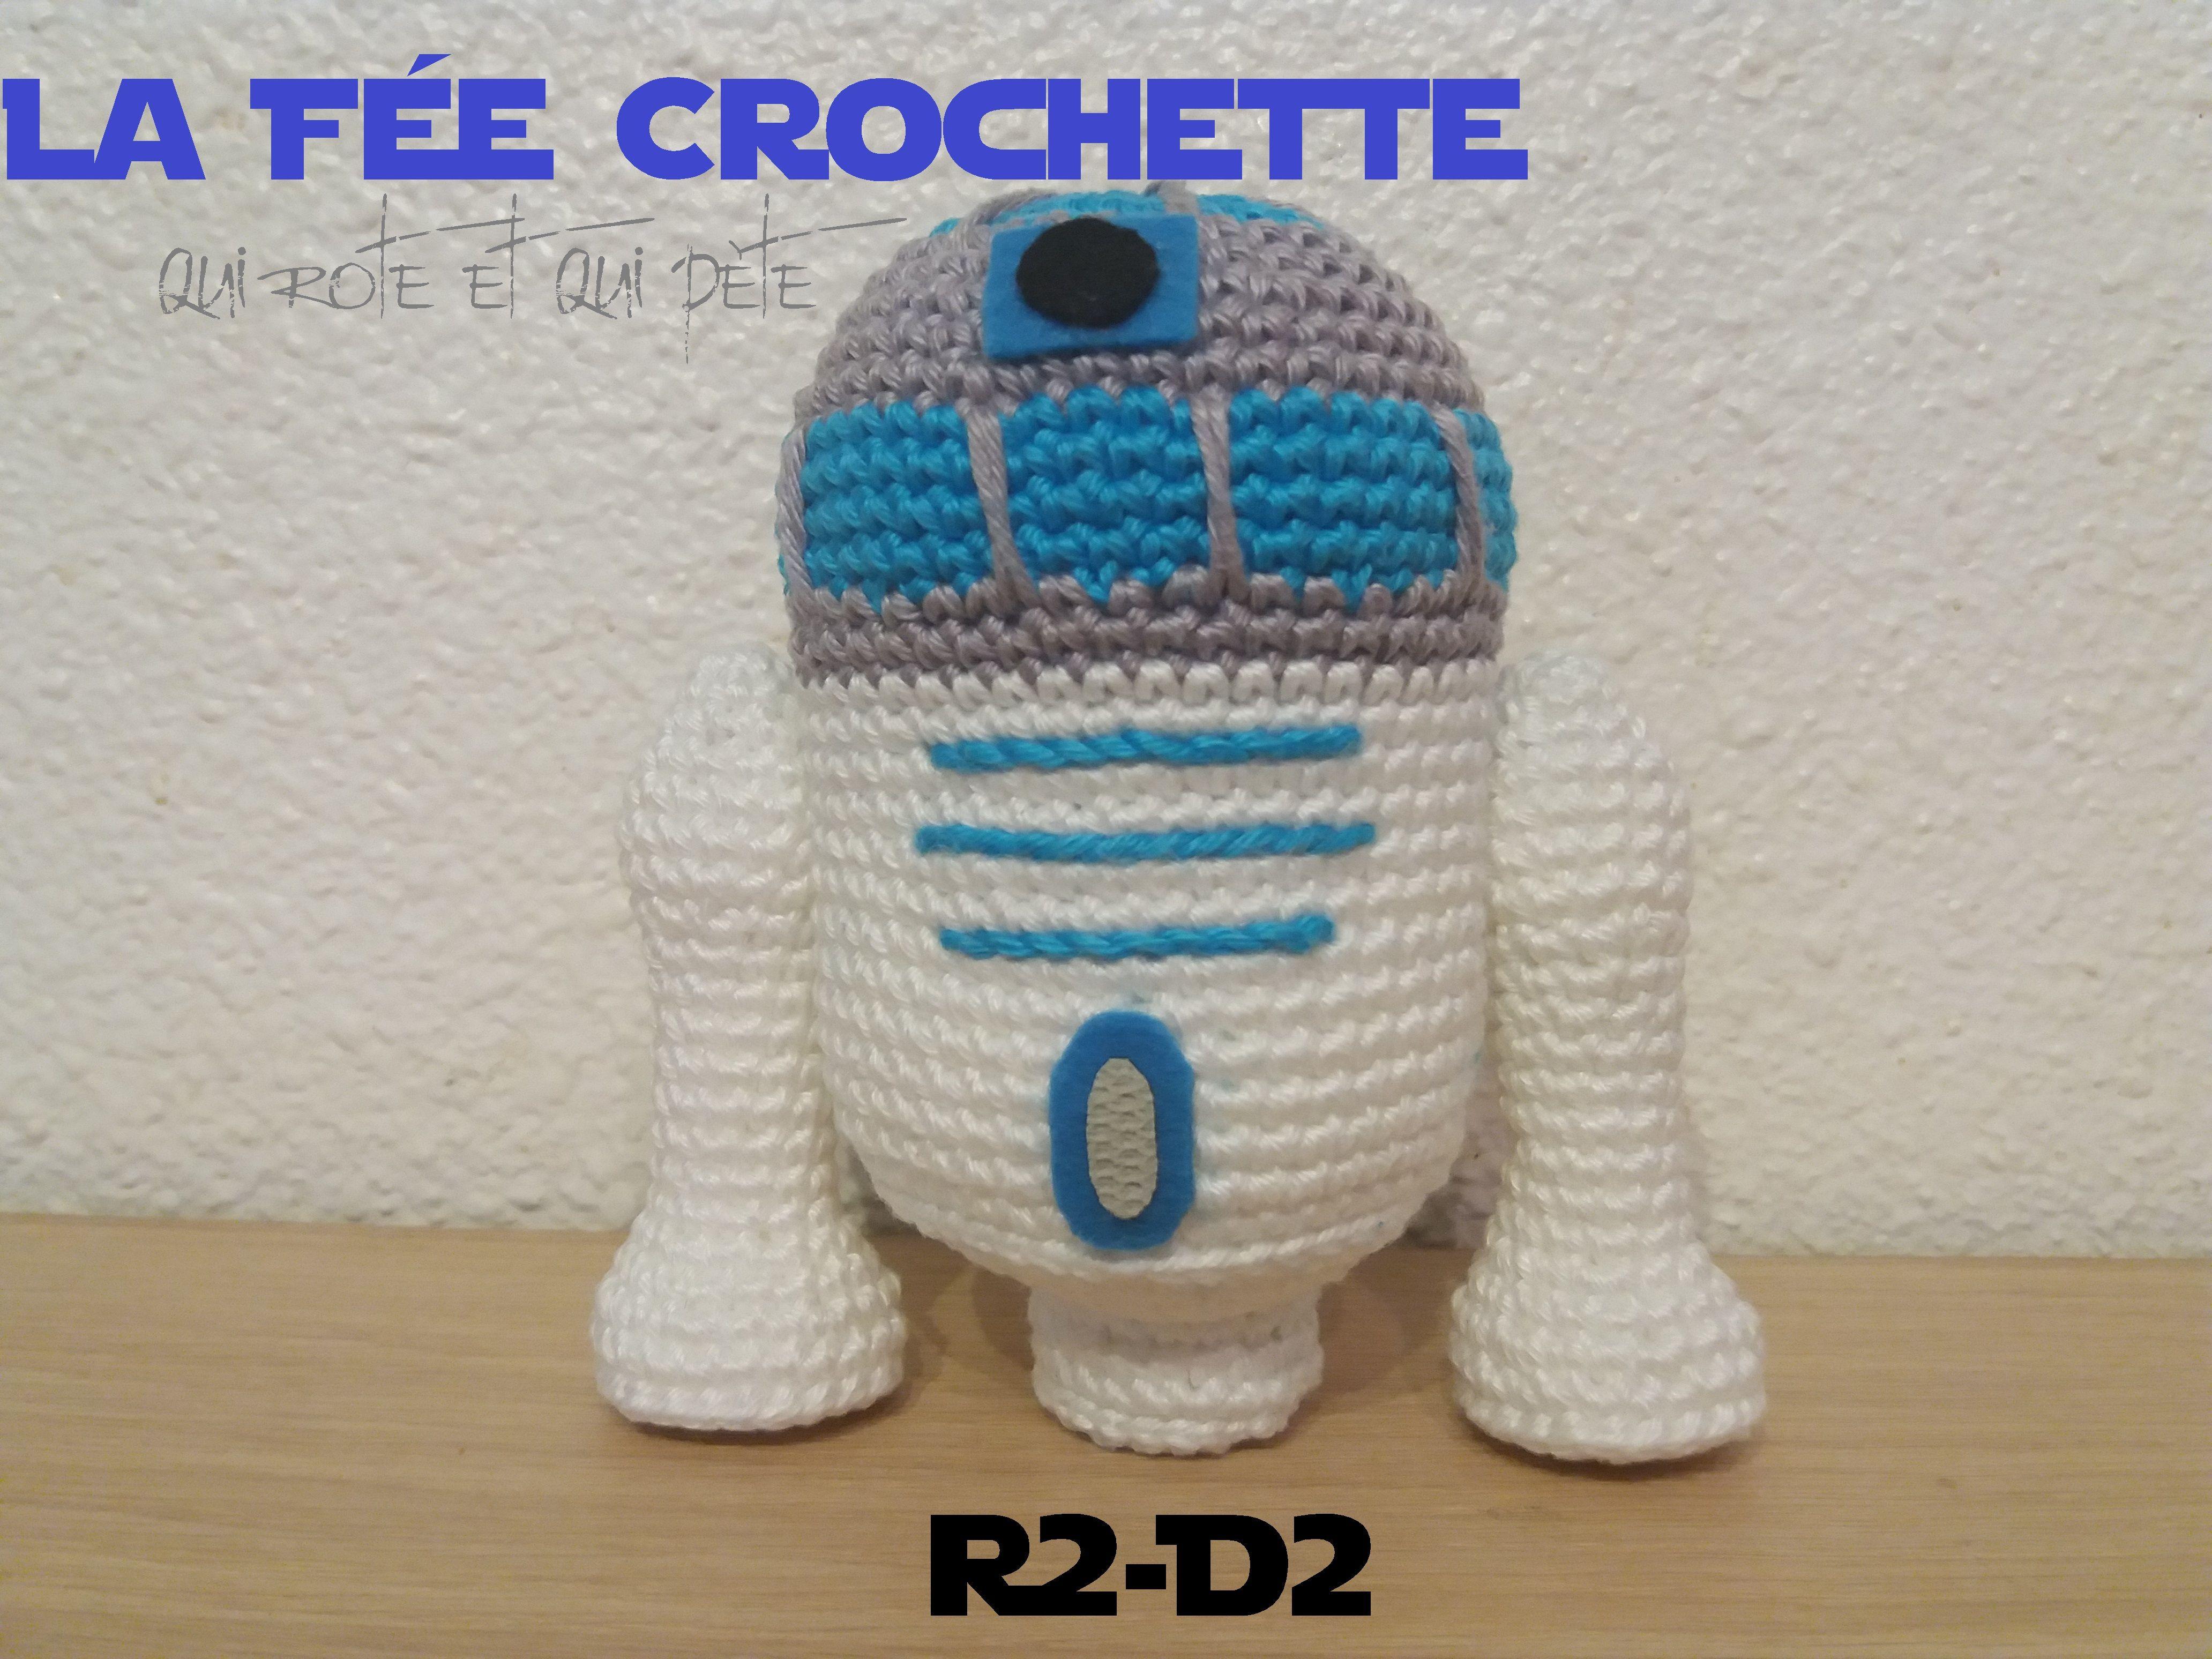 Amigurumi R2 D2 Crochet Amigurumis Pinterest R2 D2 And